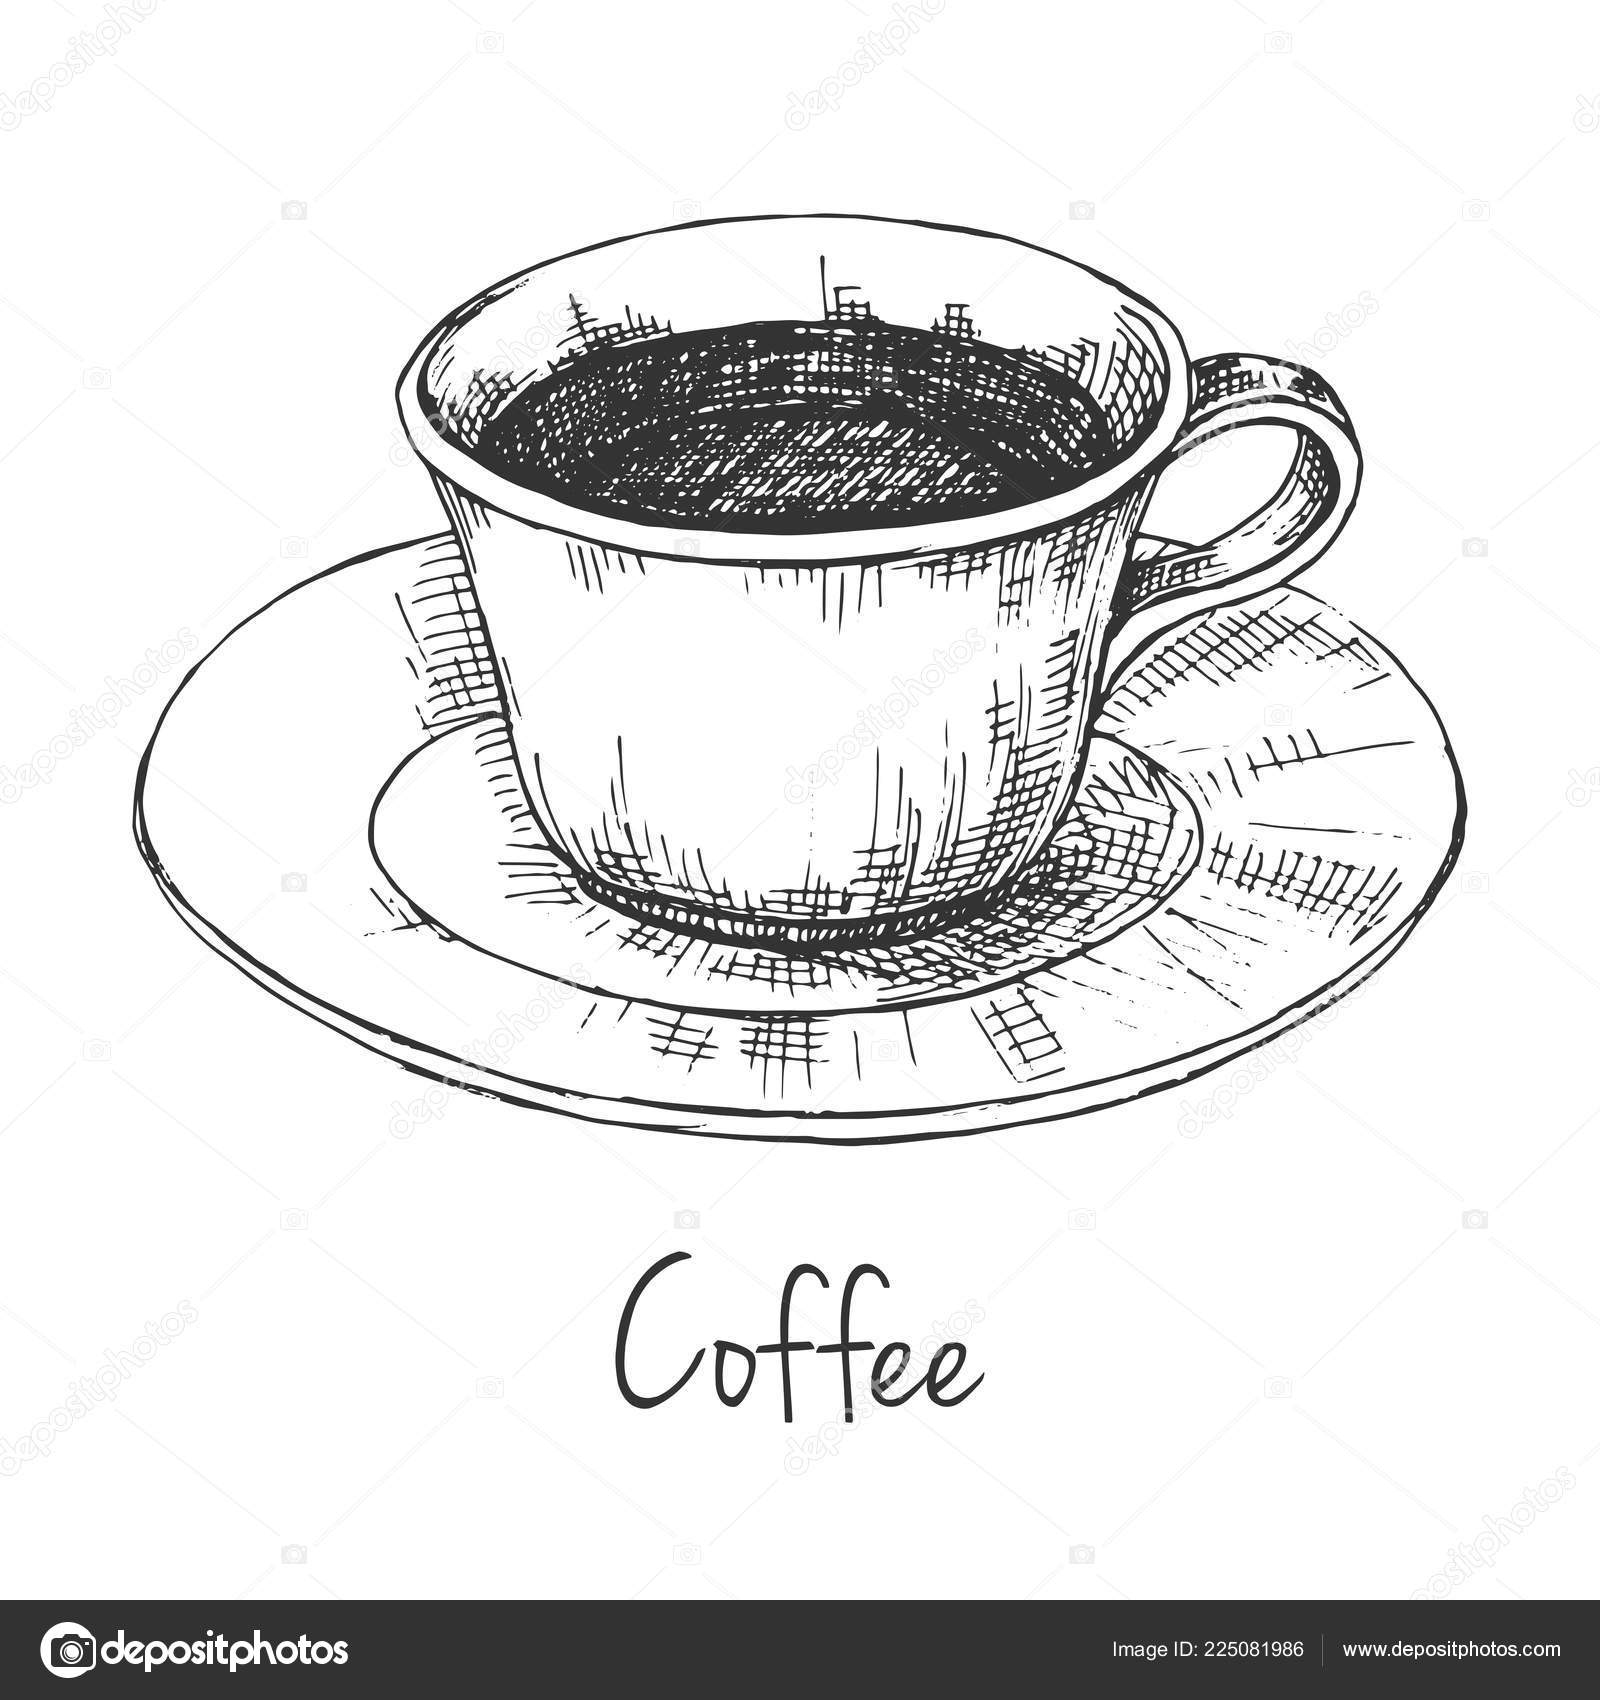 Sketch Mug Coffee Saucer Inscription Coffee Vector Illustration Sketch Style Vector Image By C Nadiia Kud Gmail Com Vector Stock 225081986